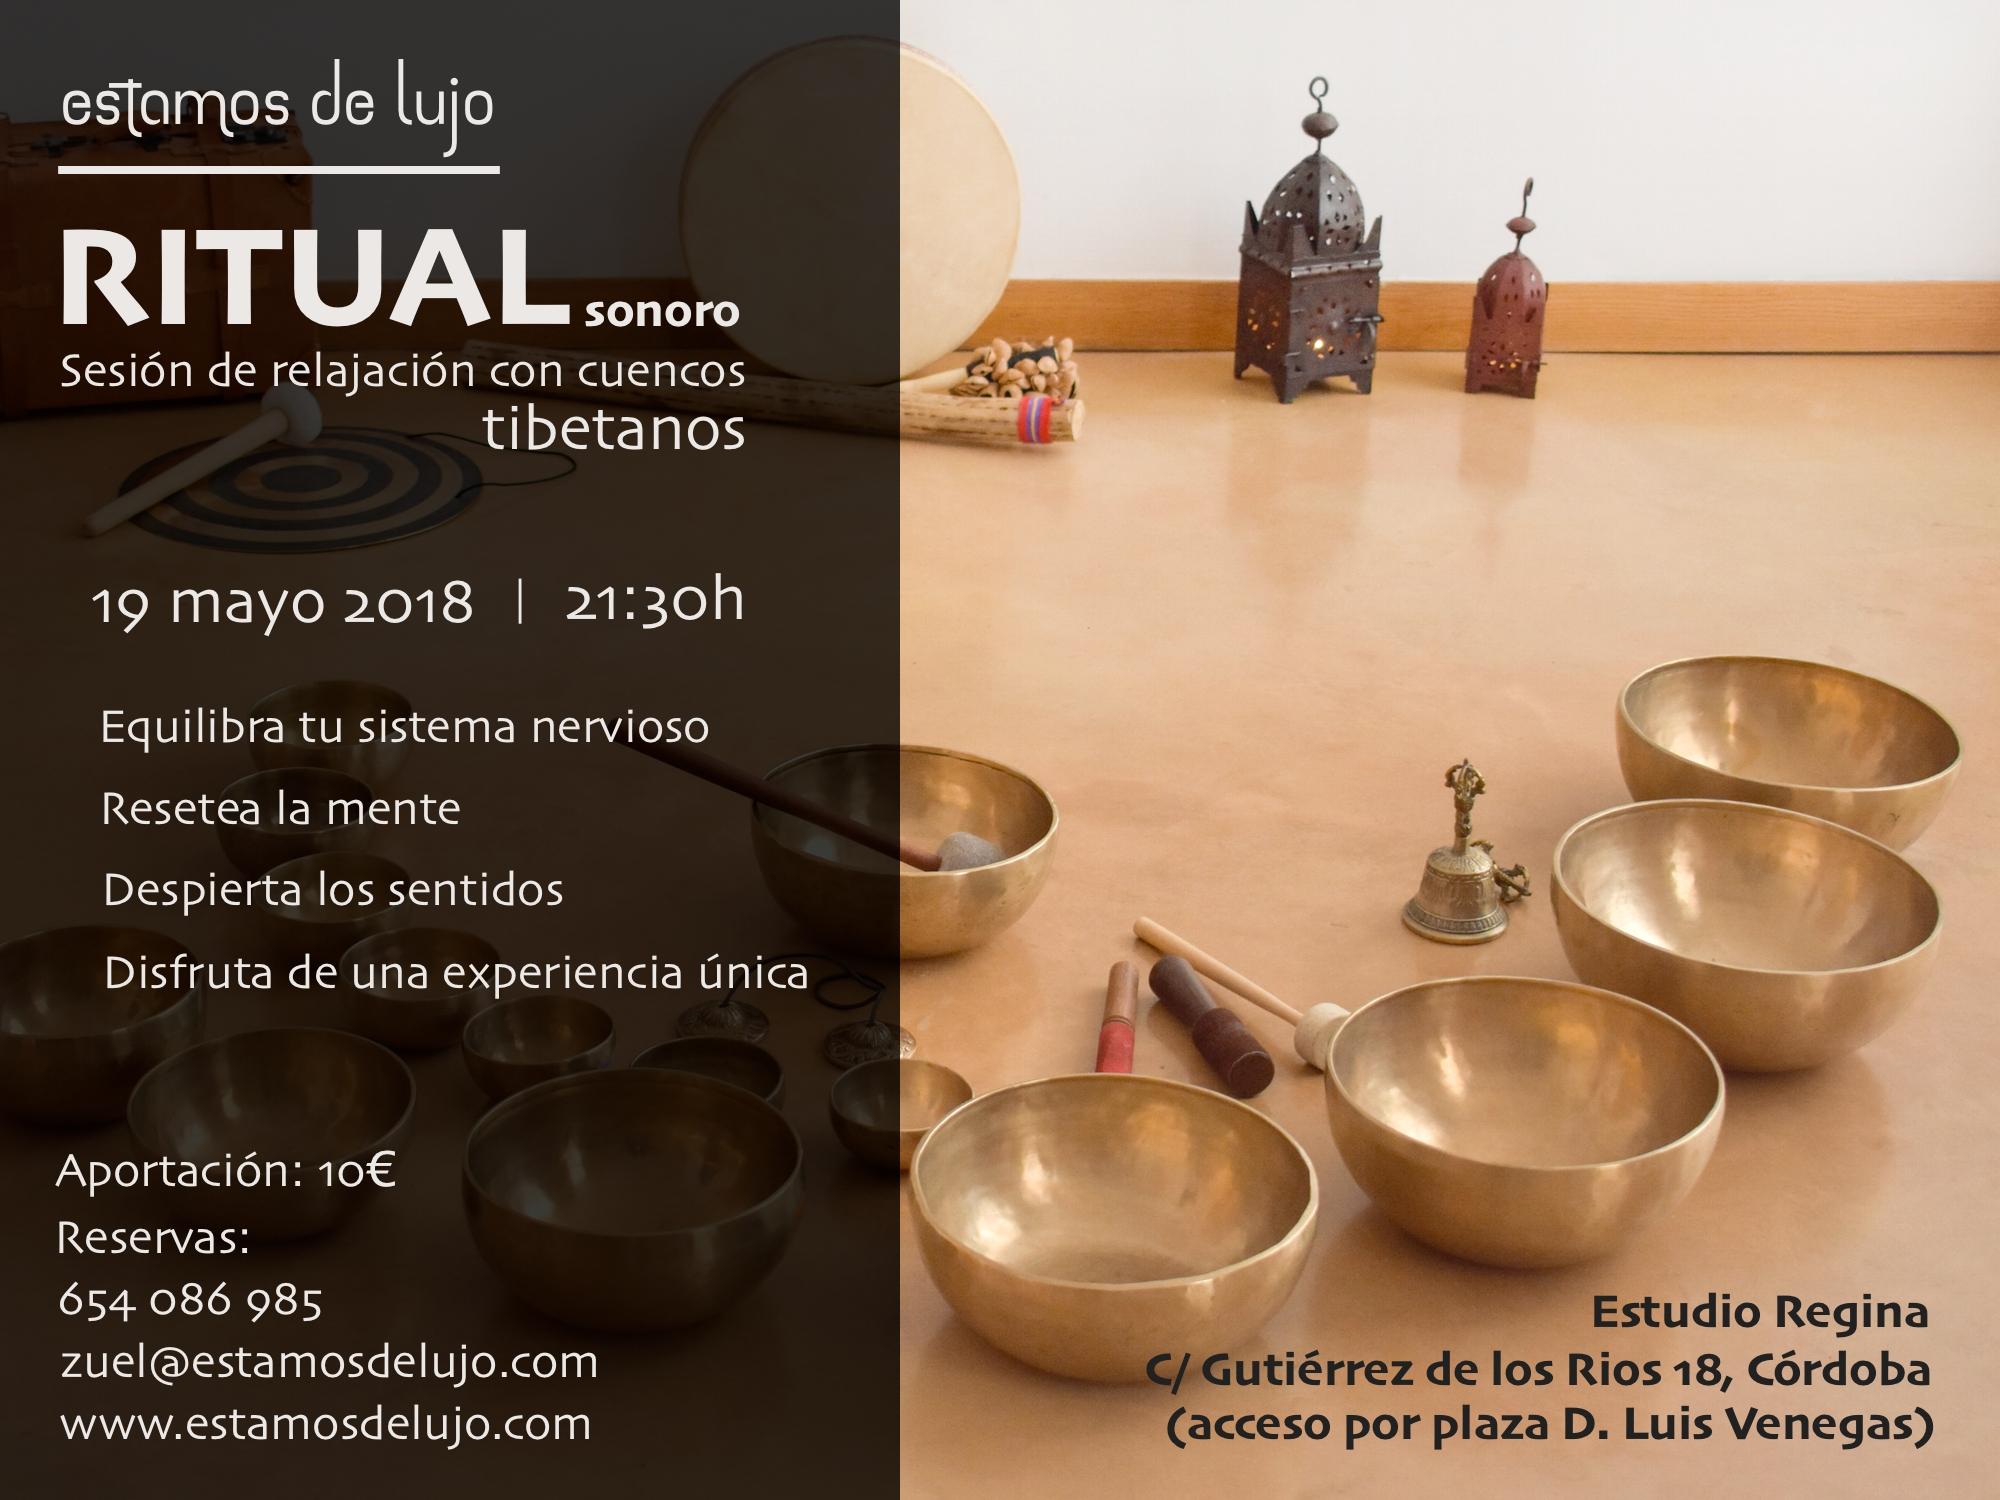 Ritual sonoro con cuencos tibetanos